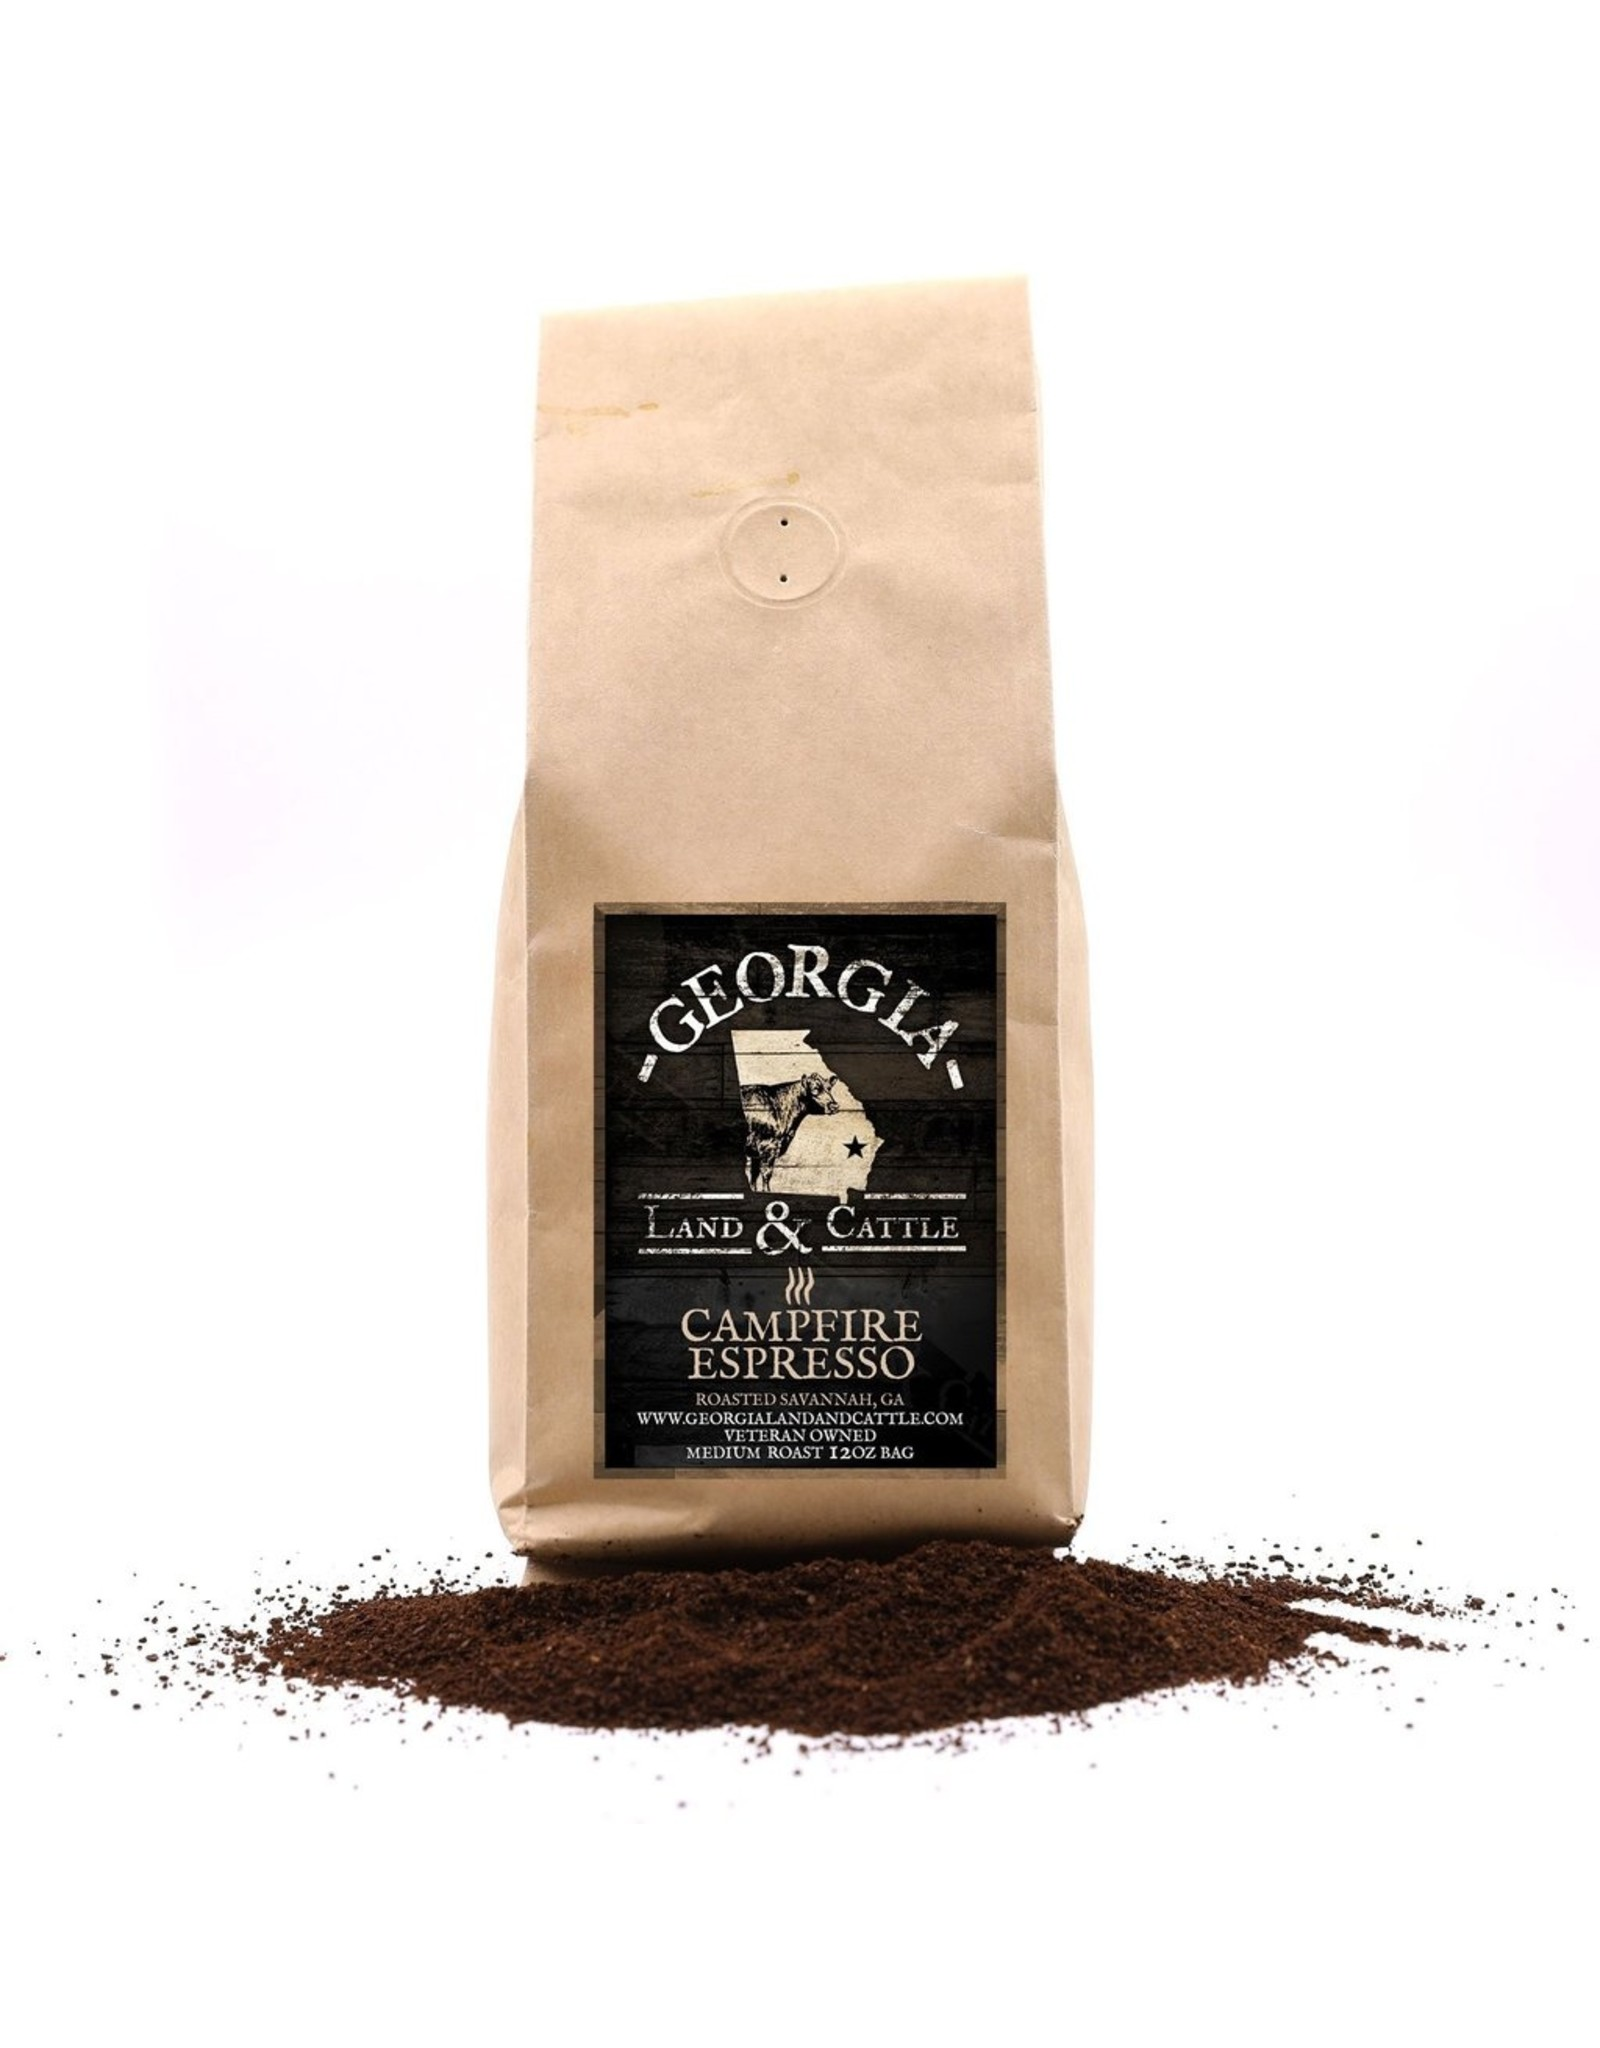 GA Land & Cattle GA Land & Cattle Campfire Espresso Coffee 12 oz